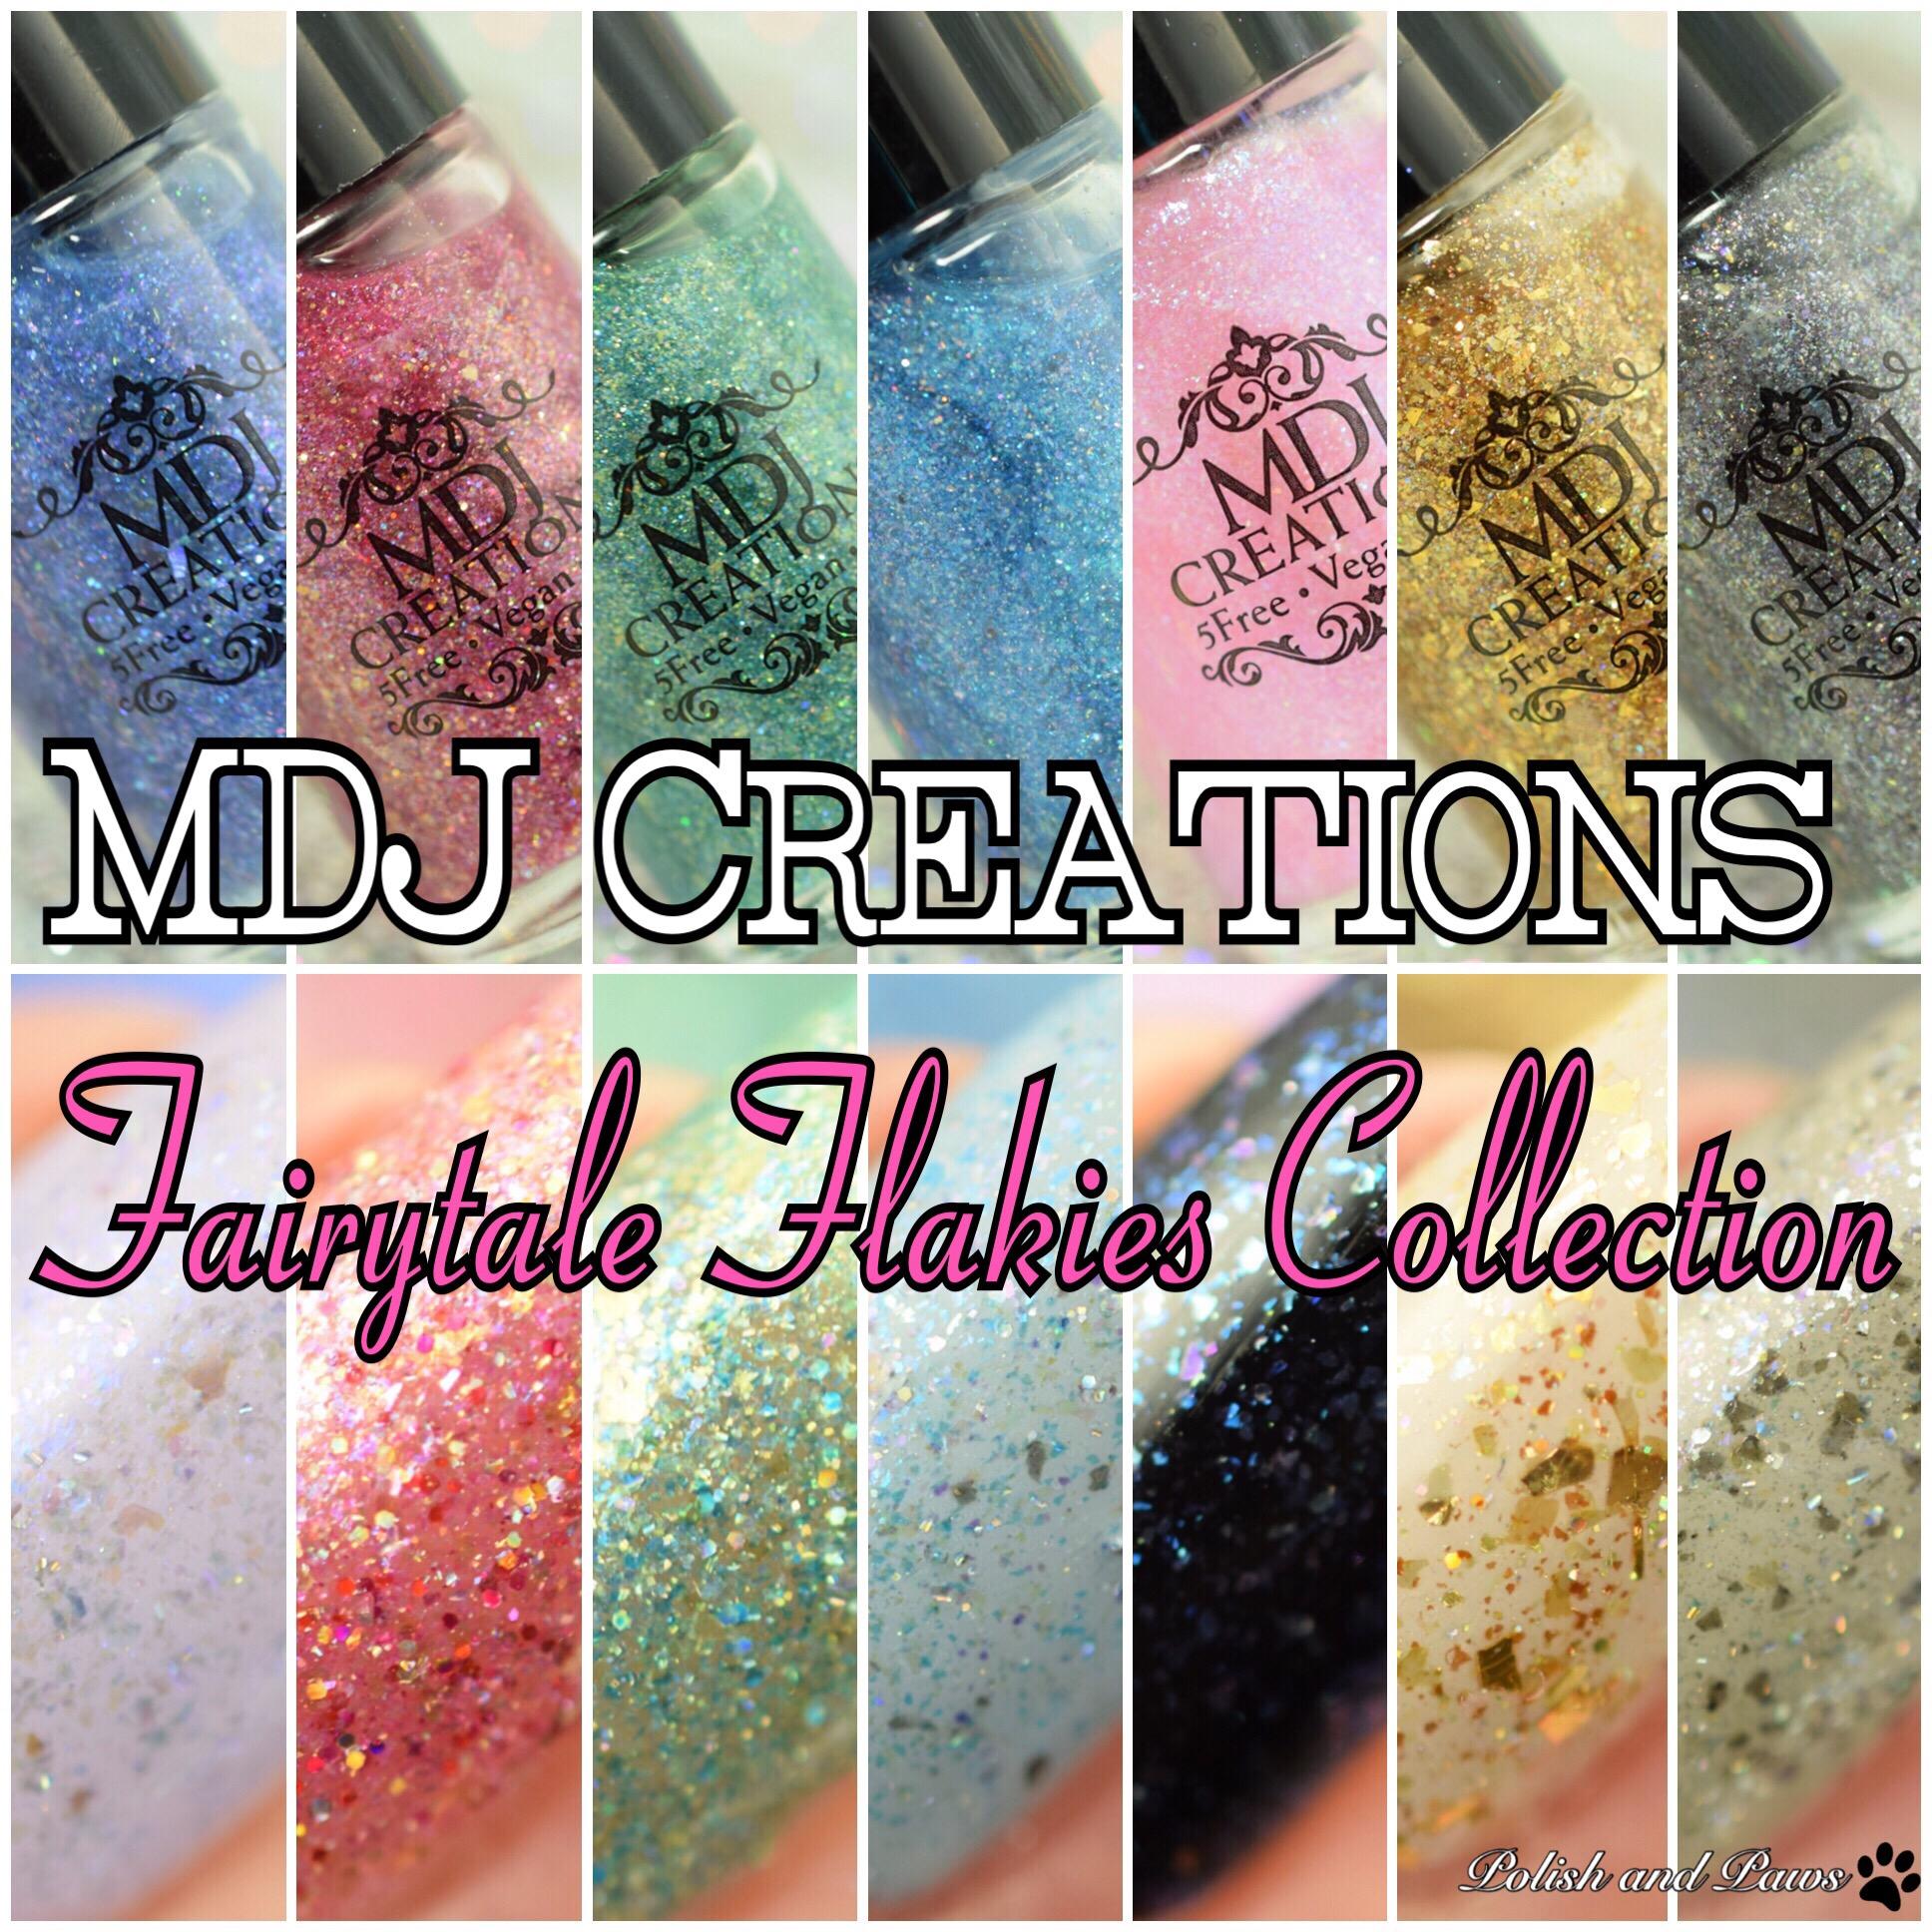 MDJ Creations Fairytale Flakies Collection